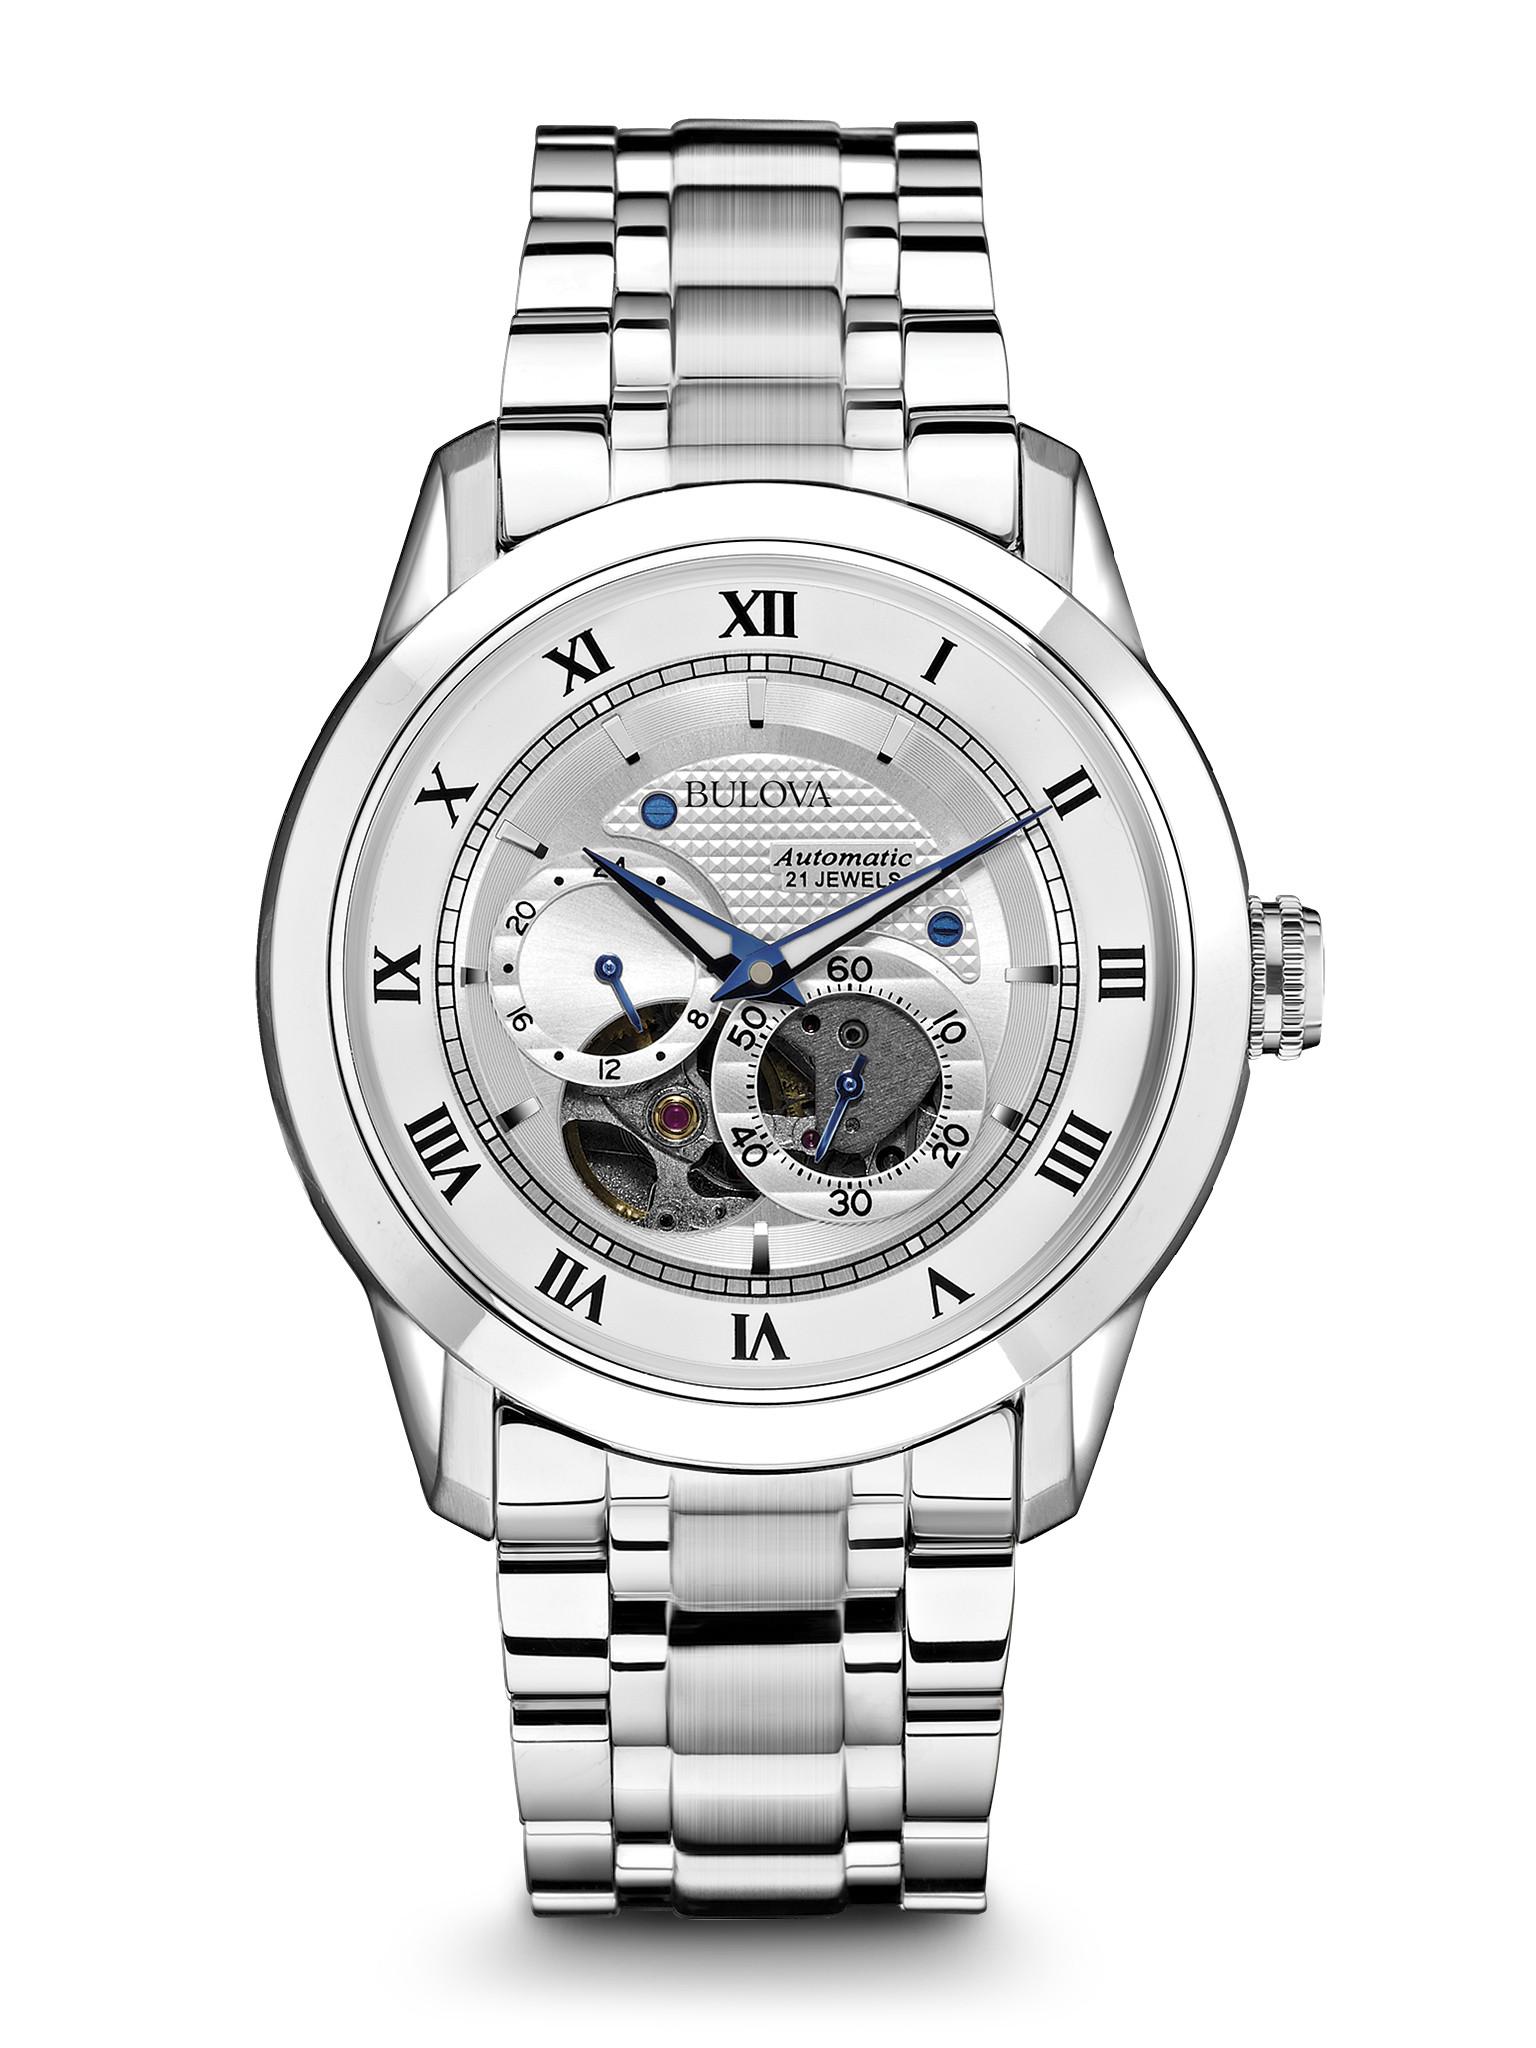 orologio bulova automatic 21 jewels